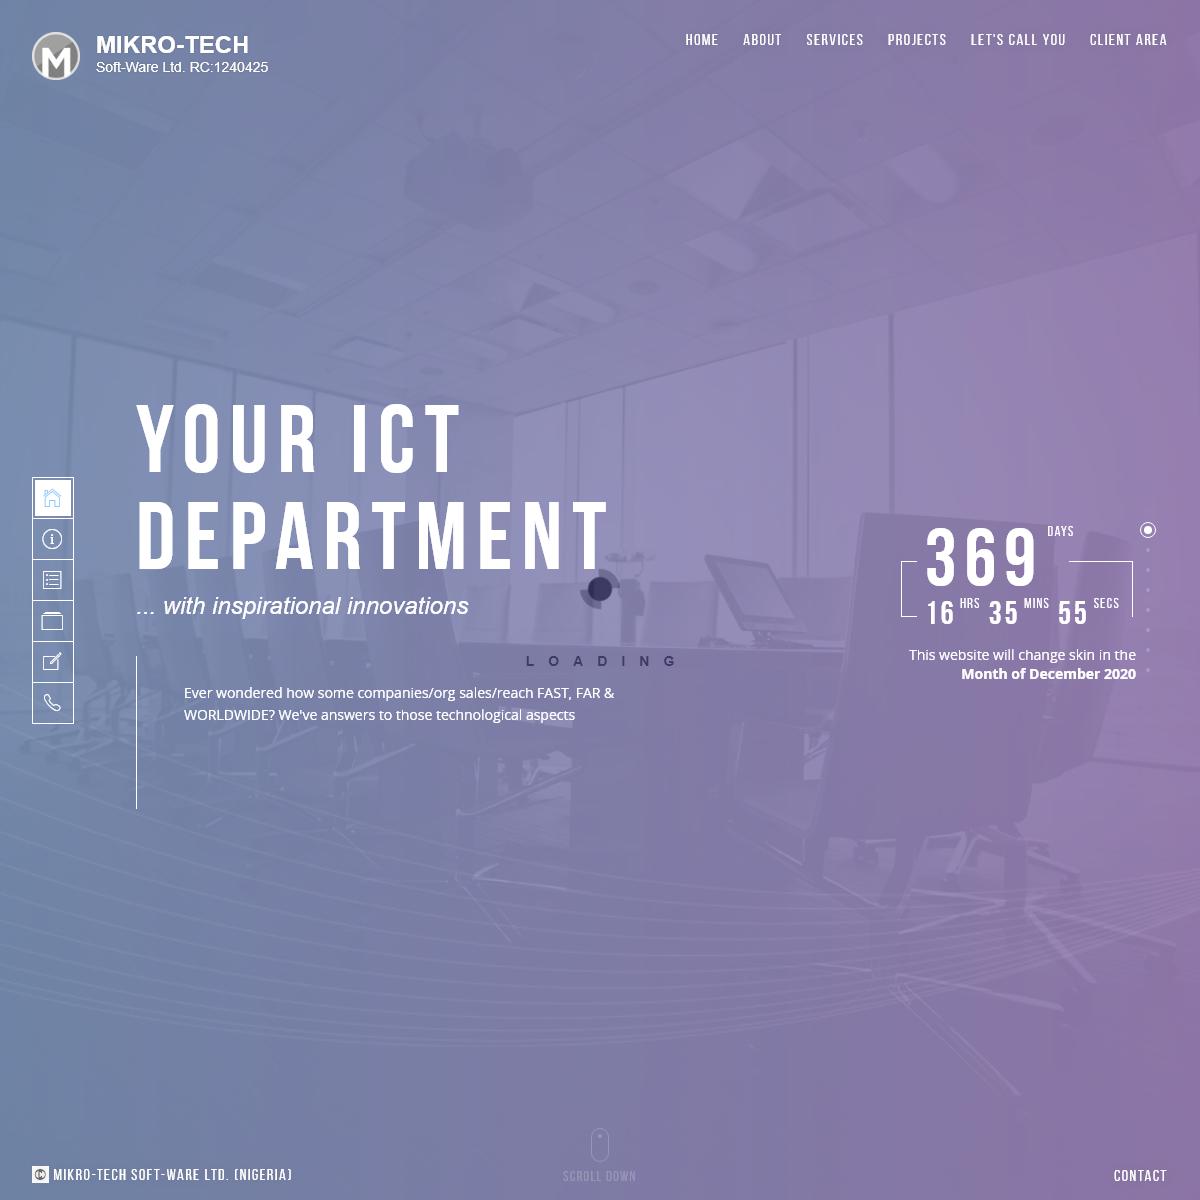 Mikro-Tech - Your ICT Department